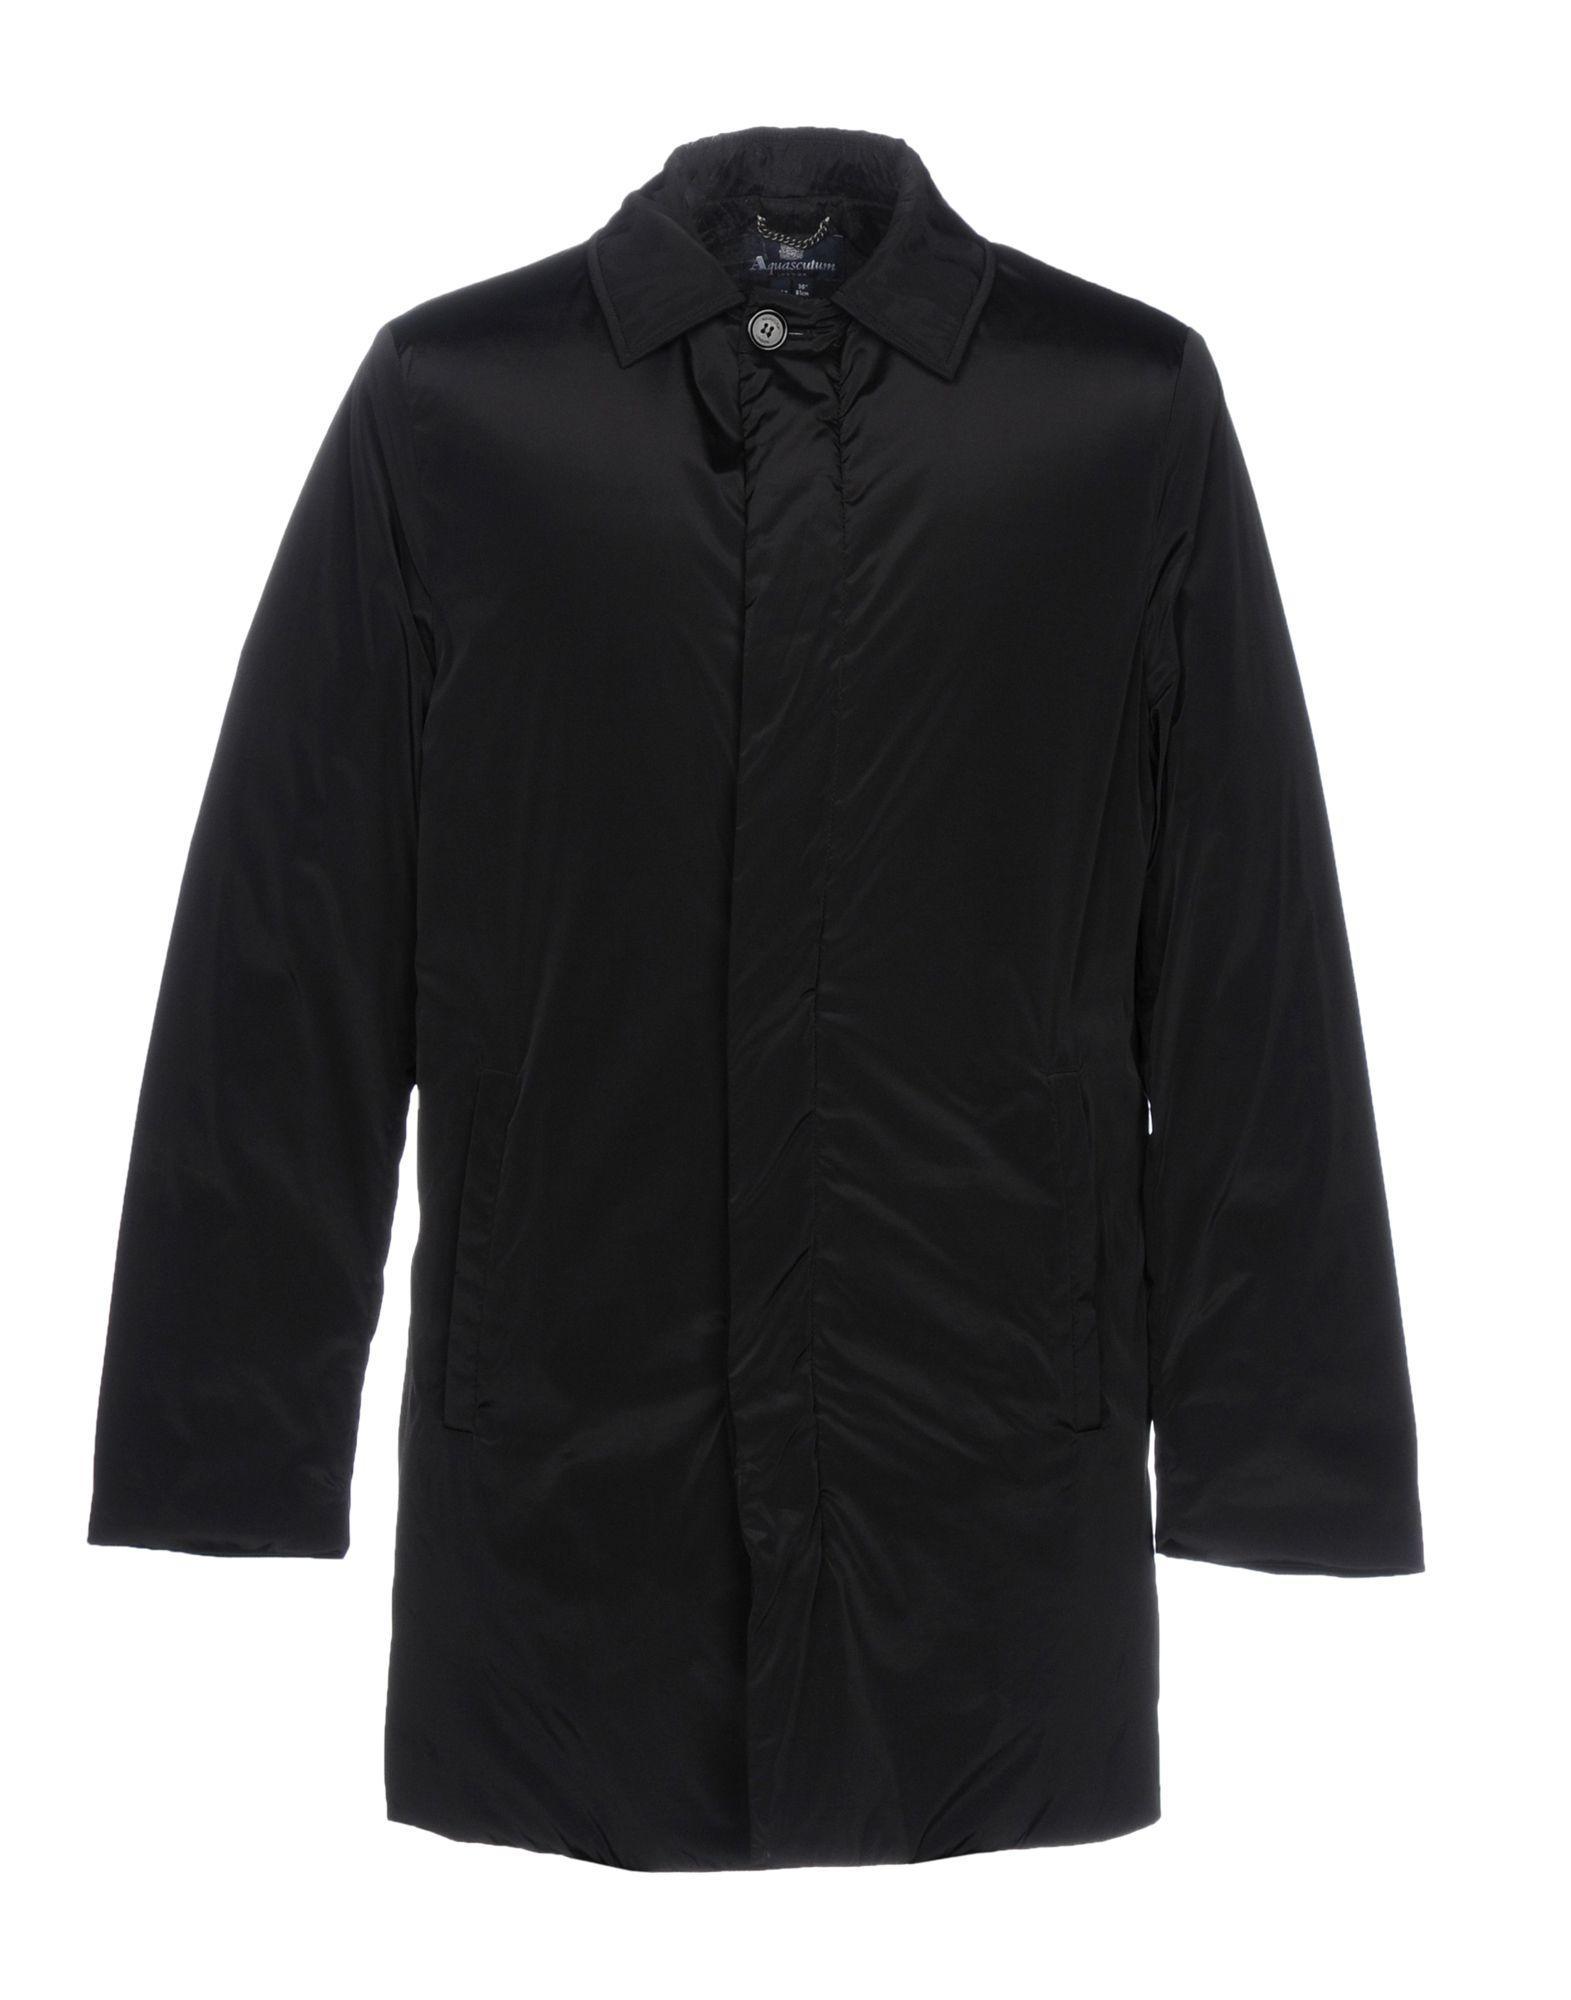 Aquascutum Jackets In Black